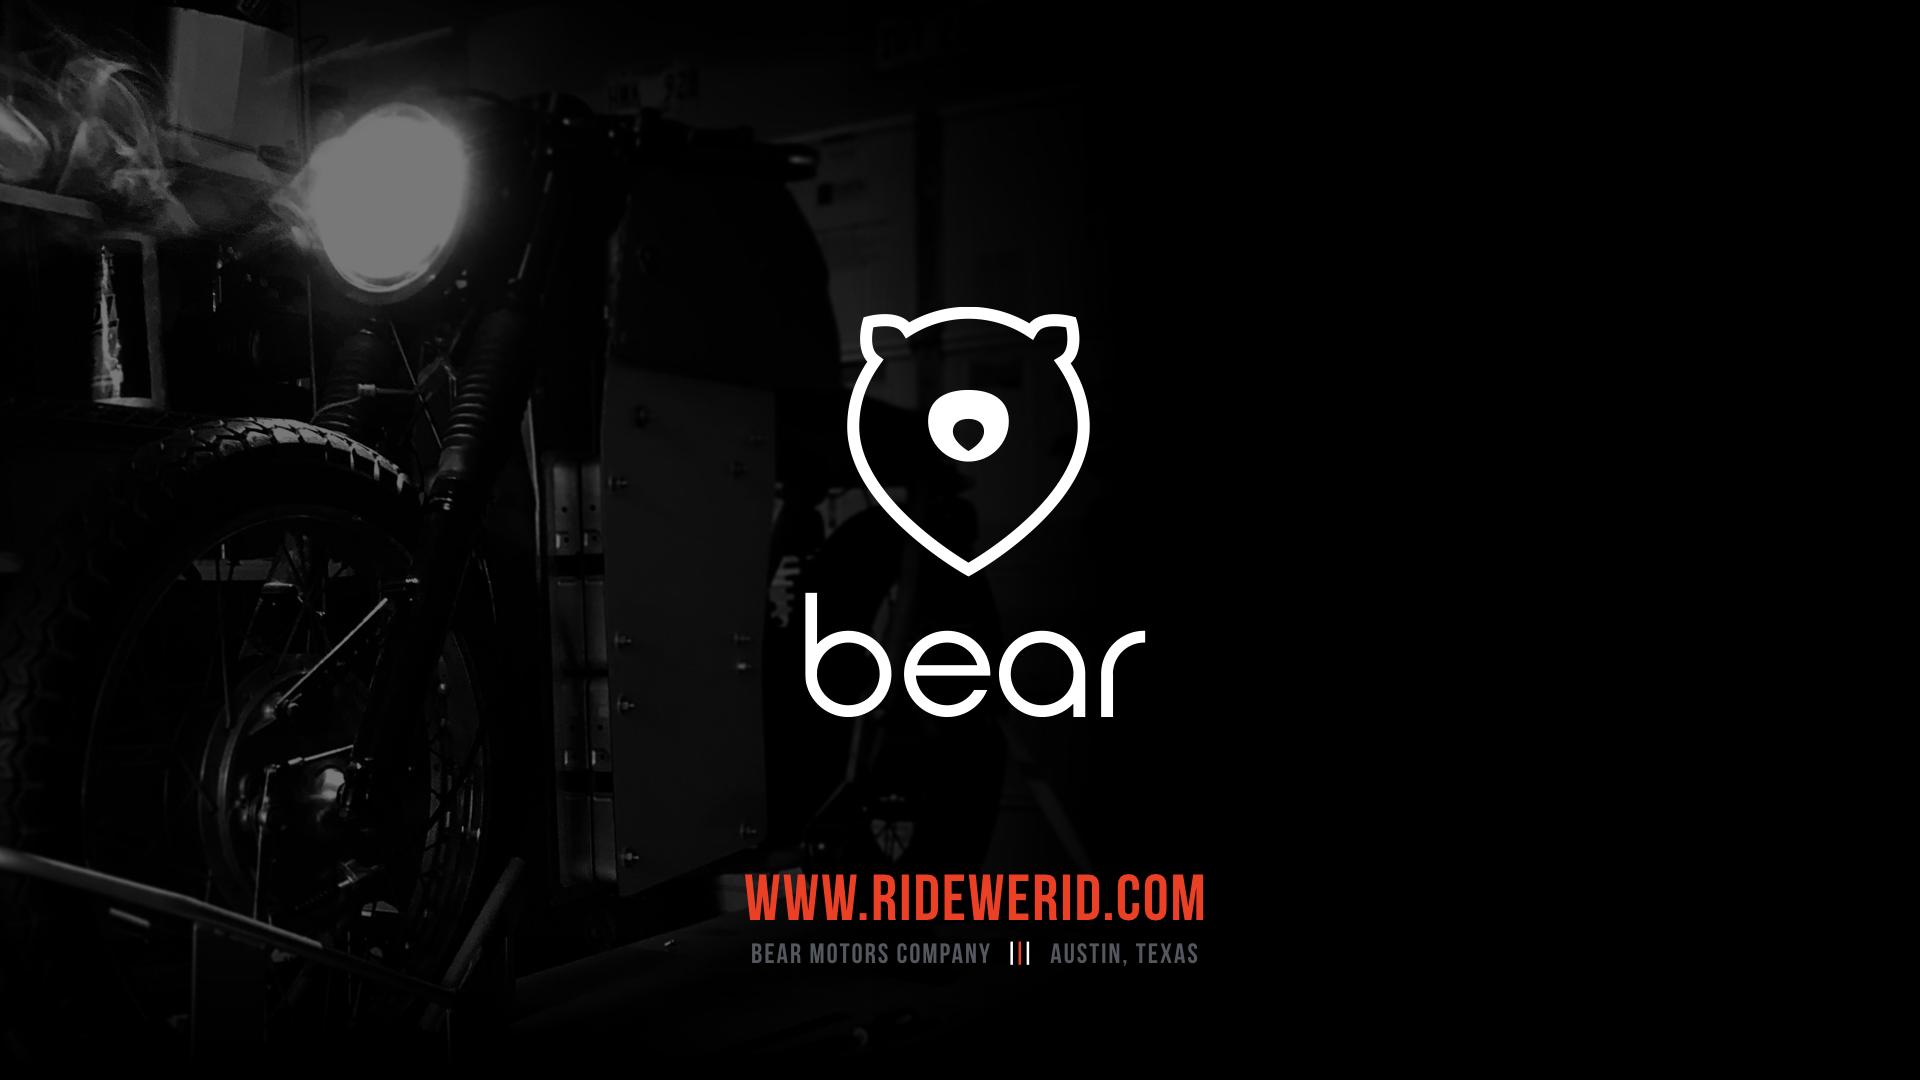 BearMotors_readingDeck_SEED_mm02.018.png